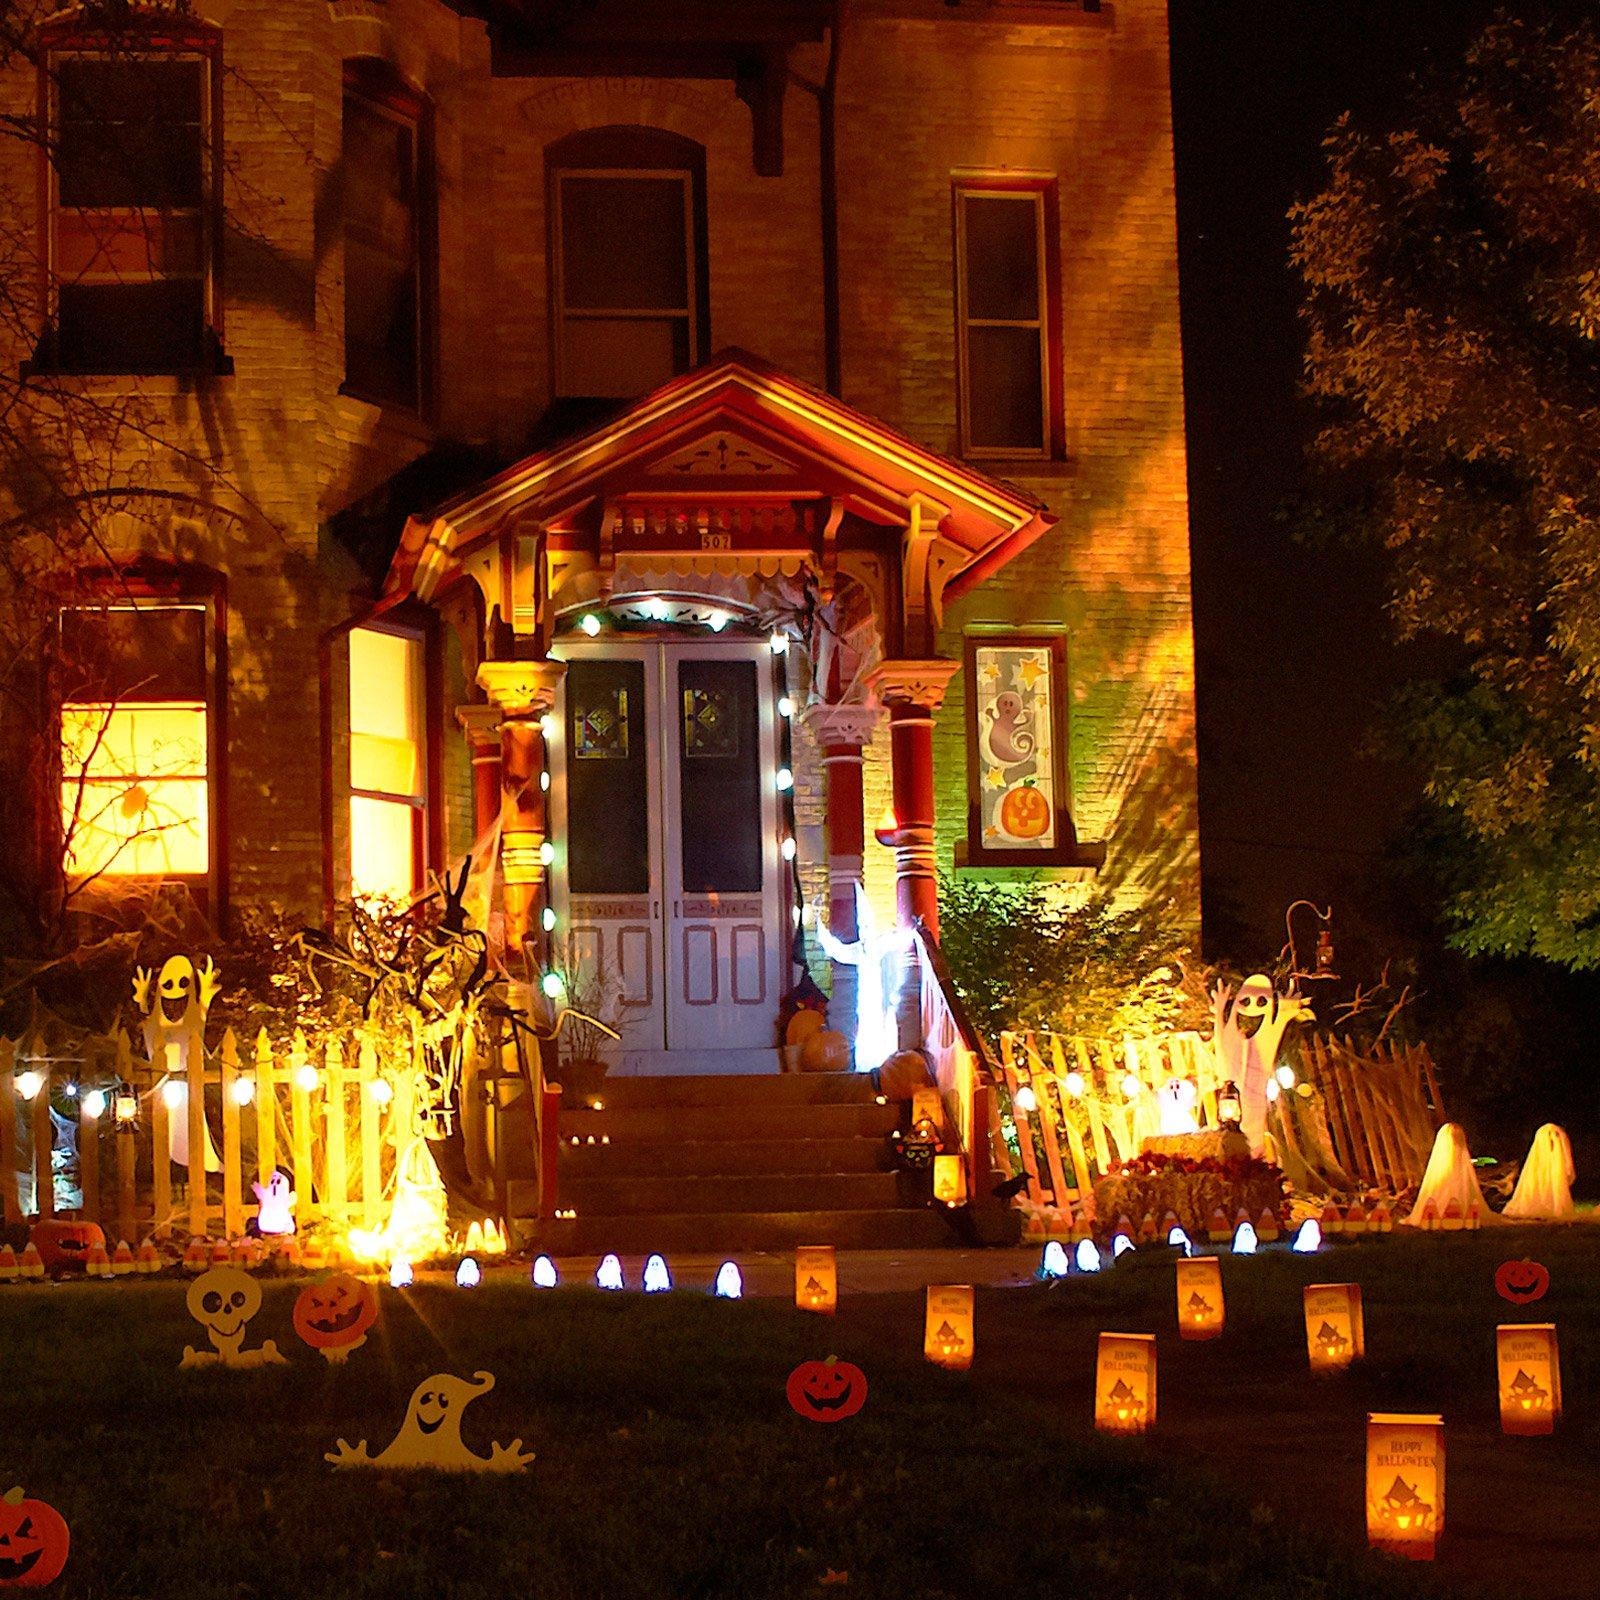 the-eccentric-halloween-exterior-decorations-mildirectory-decoration-images-unique-outdoor-halloween-creative-decorations.